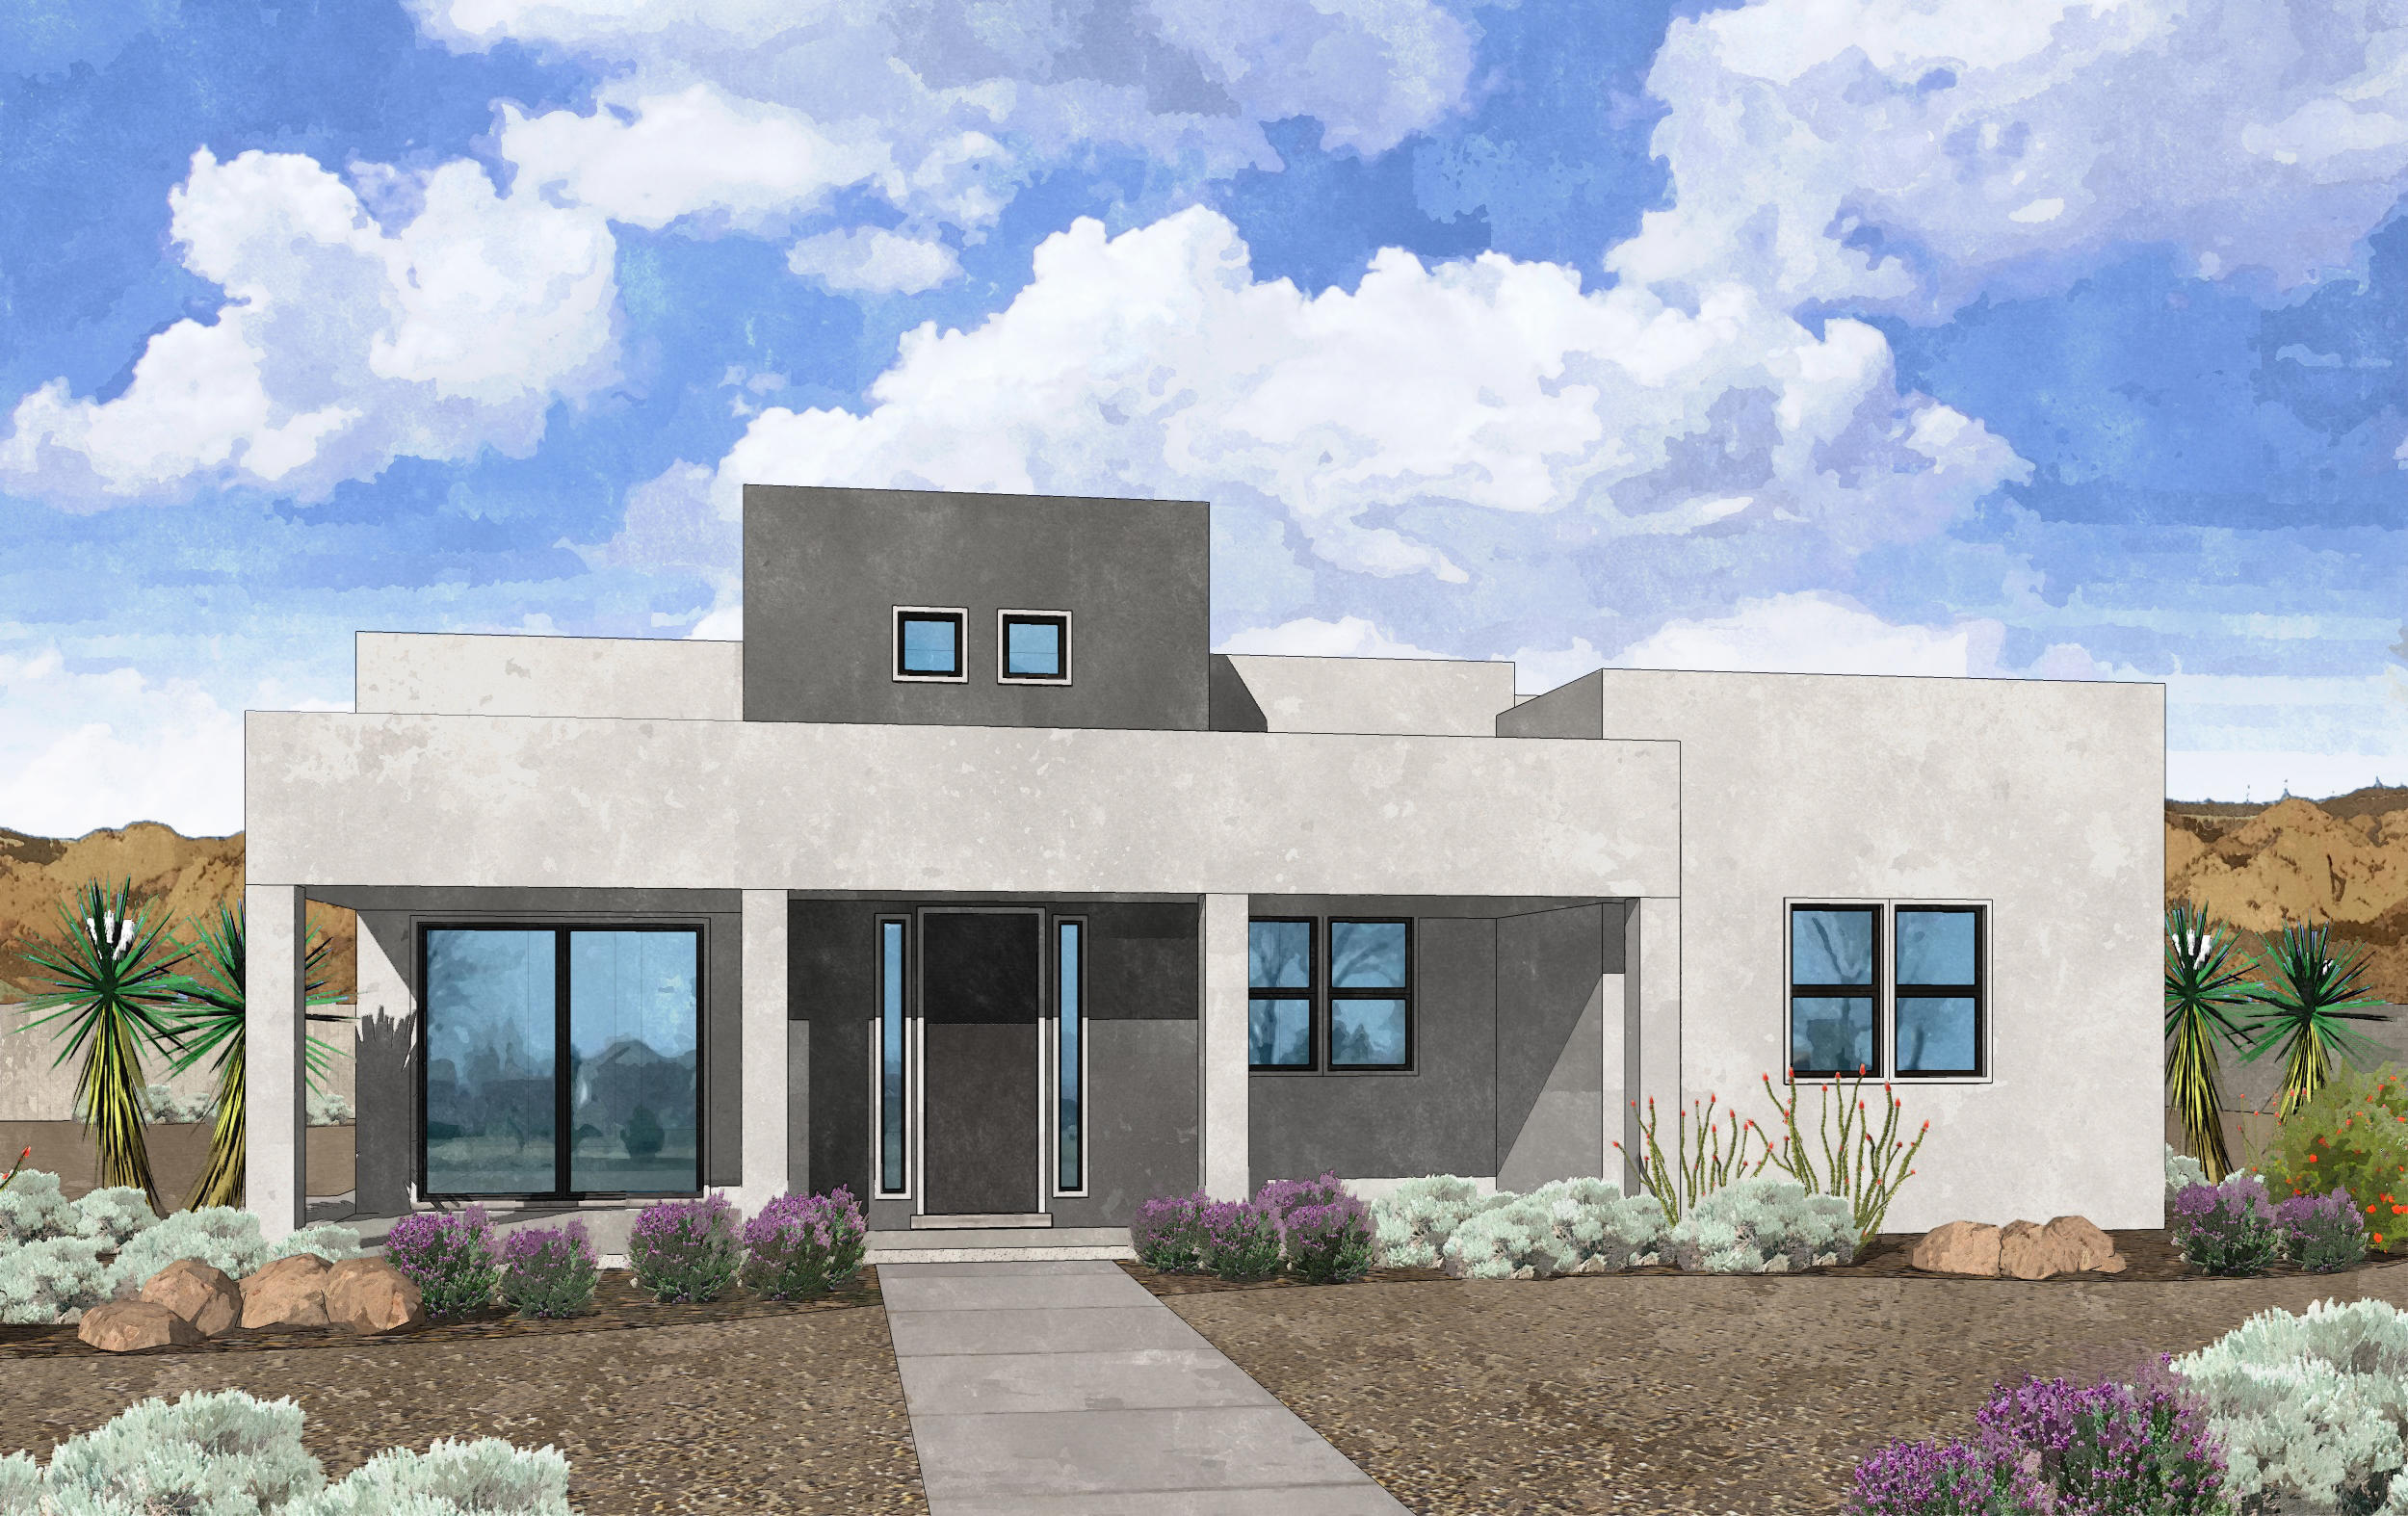 Mesa Del Sol Nbrhd Montage Un Real Estate Listings Main Image